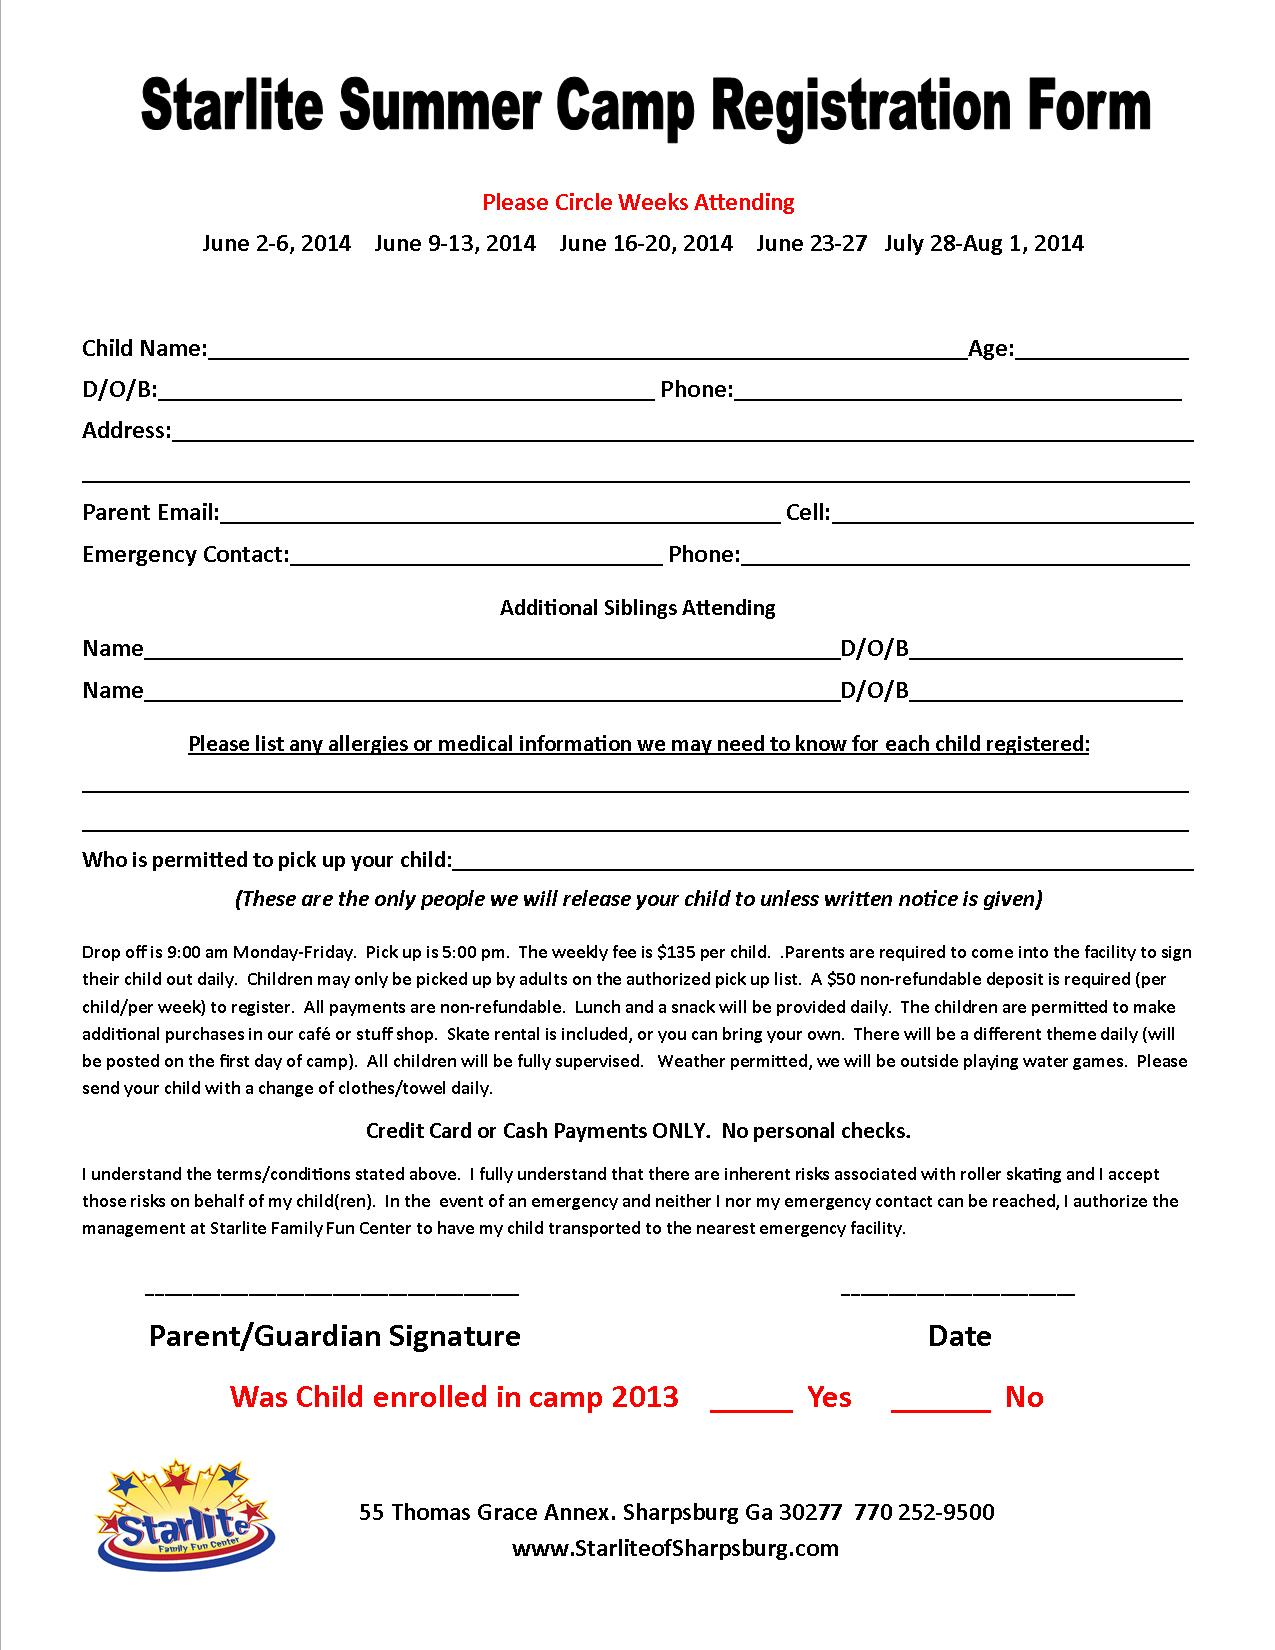 summer camp registration form template Success